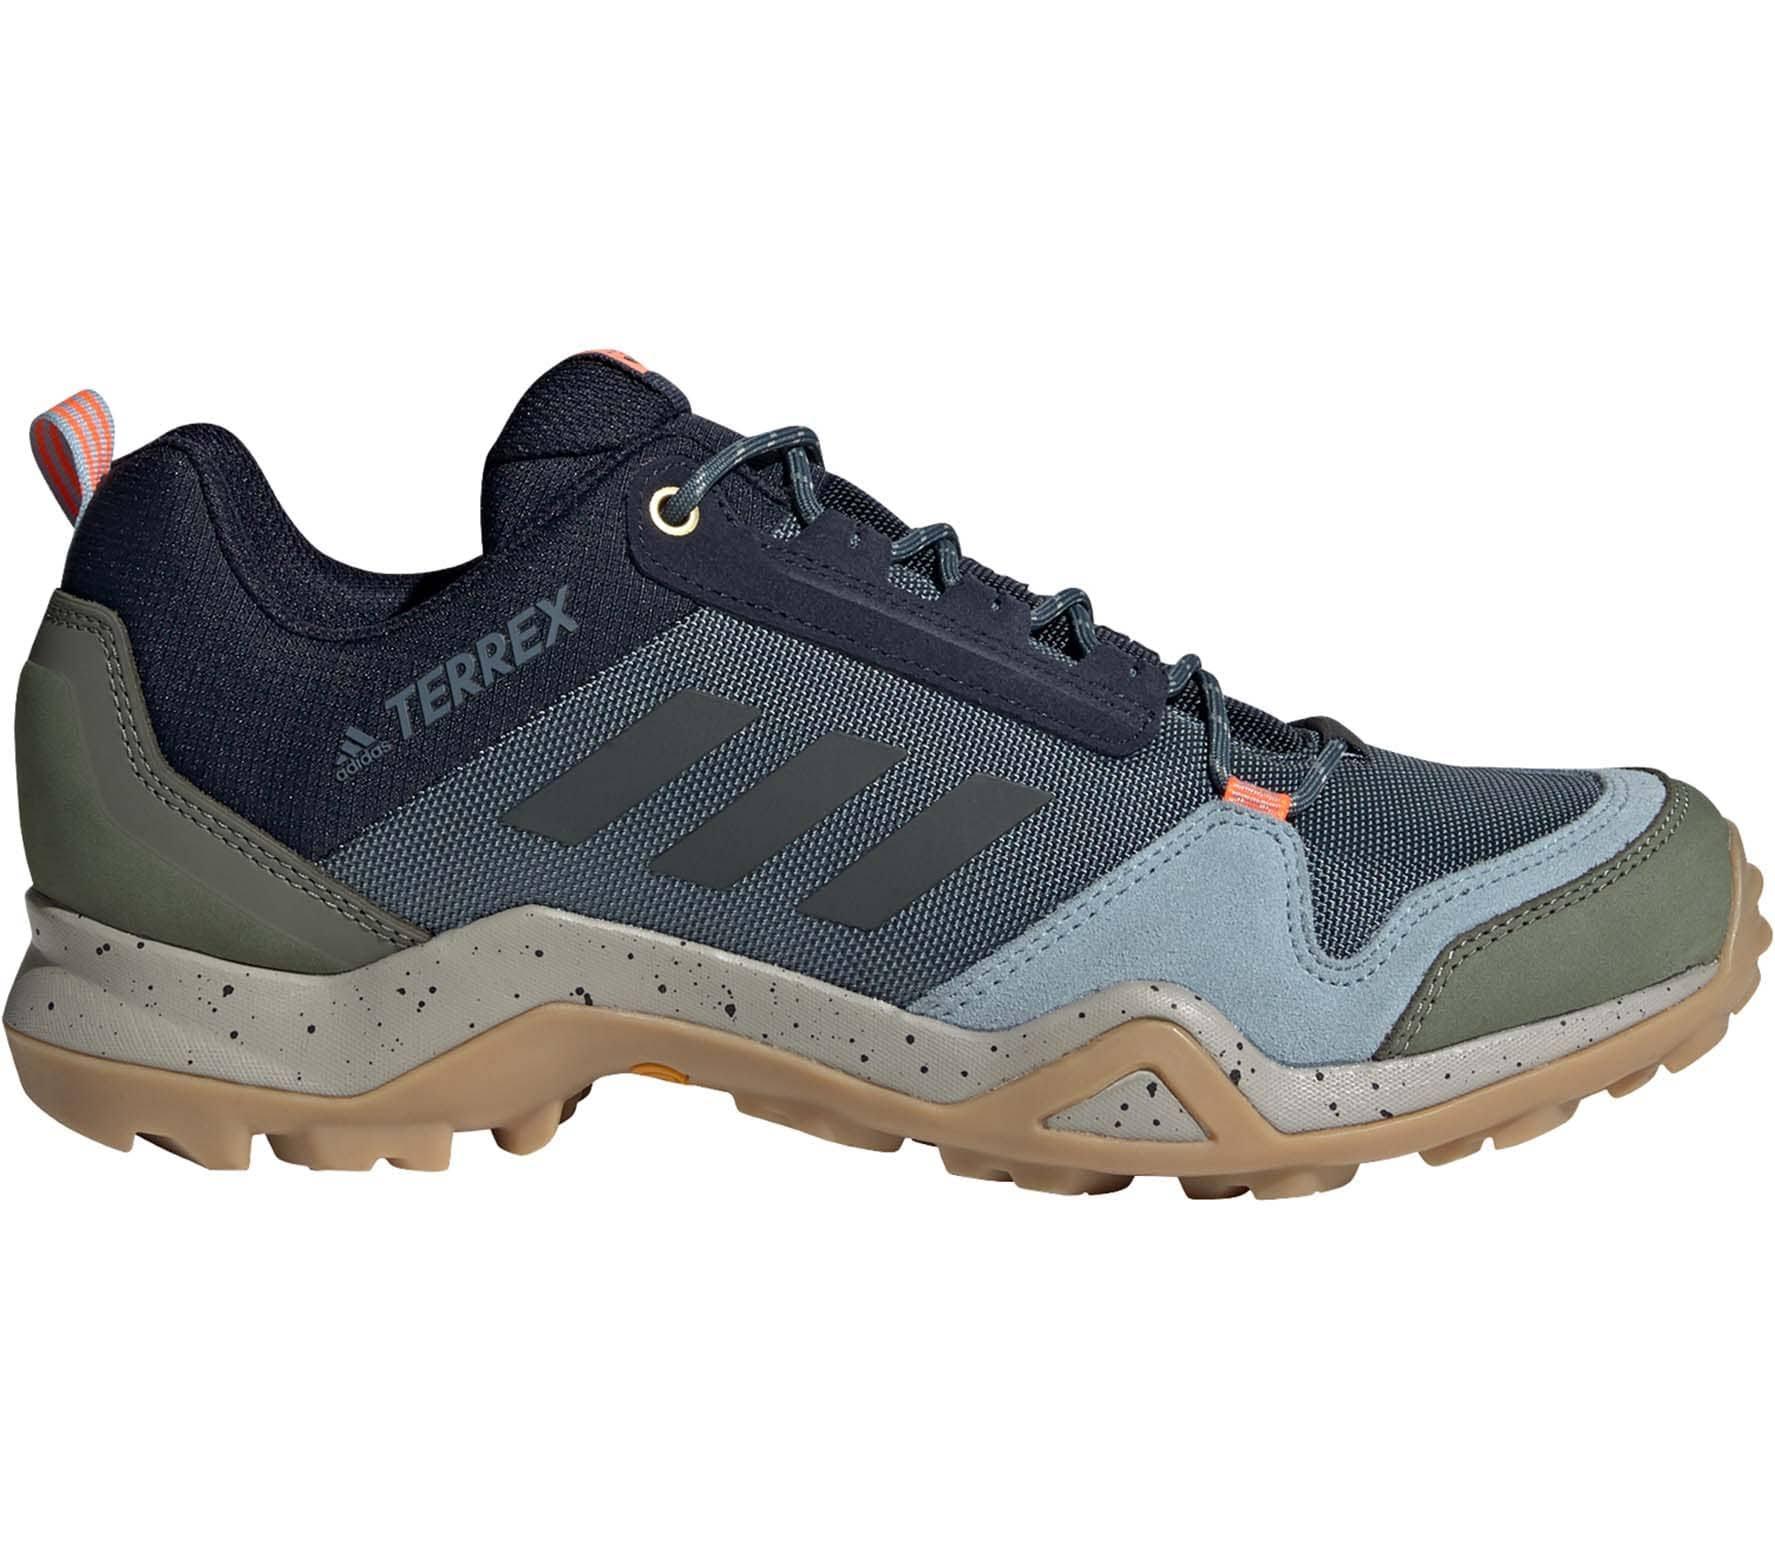 Adidas Terrex AX3 Hiking Shoes Hiking - Mens - Blue